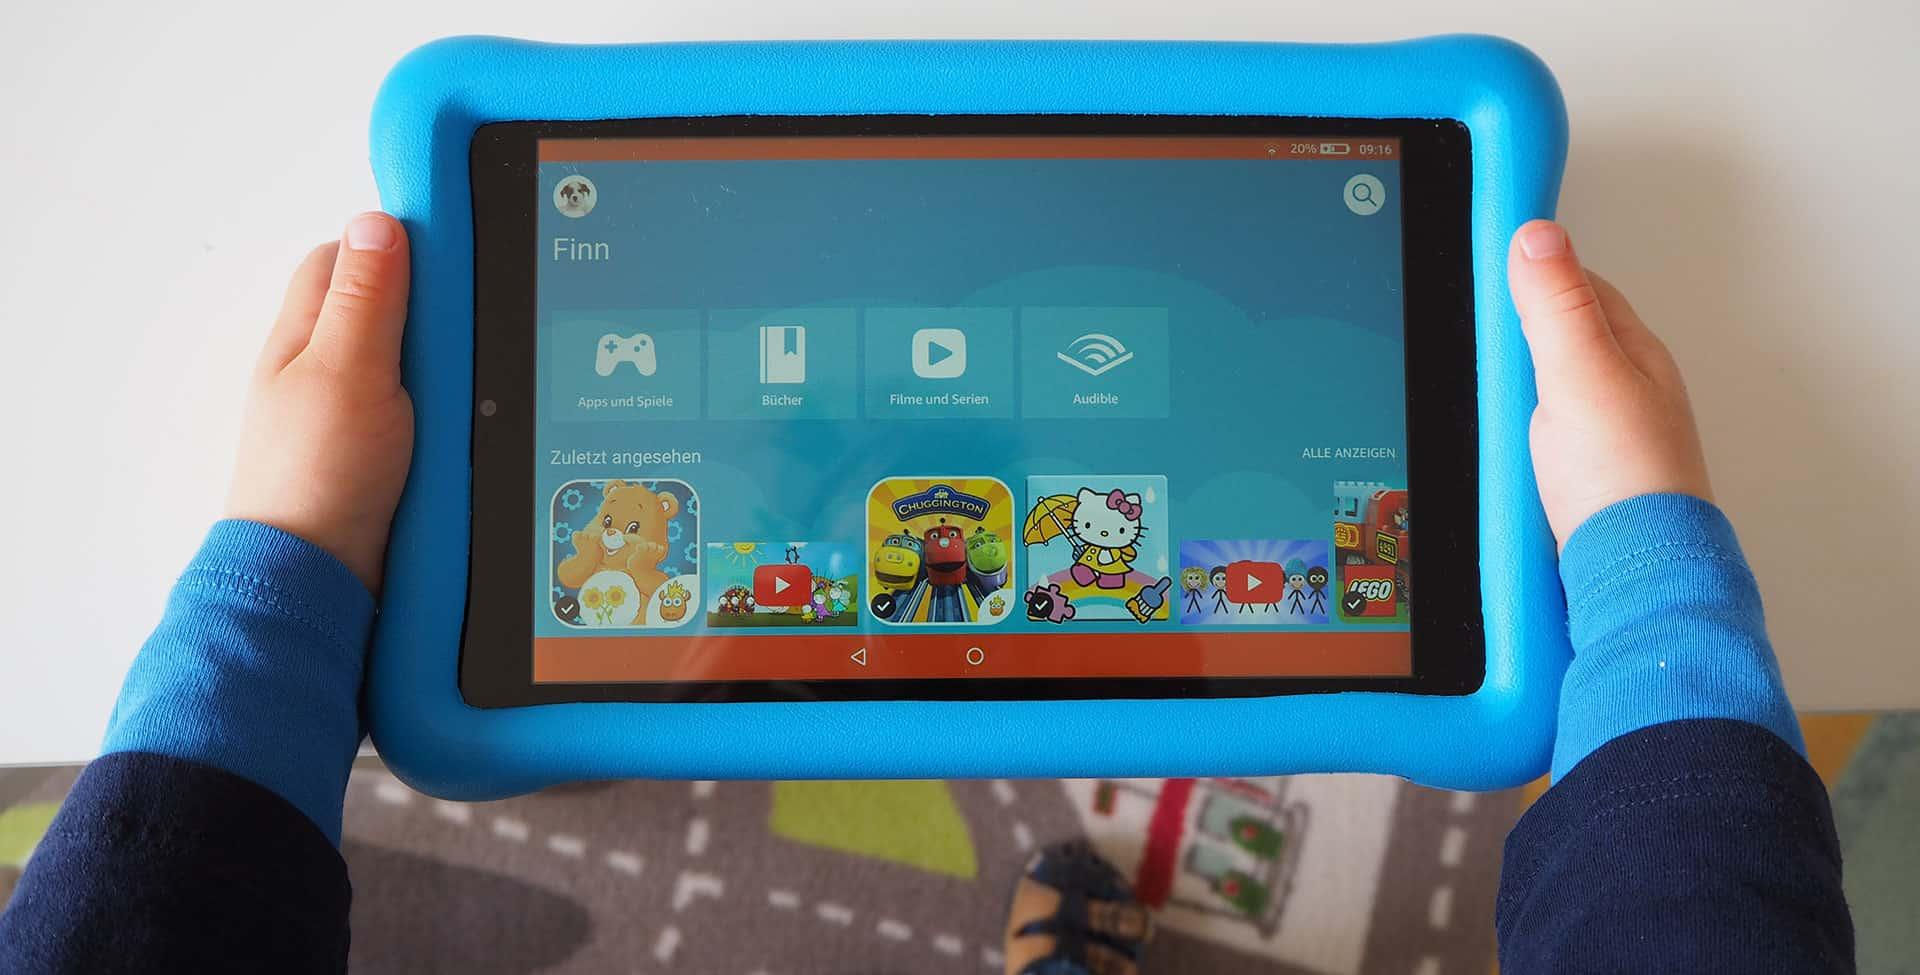 Amazon Fire Hd 8 Kids Edition Im Test Tablet Fur Kinder ツ Papatestet